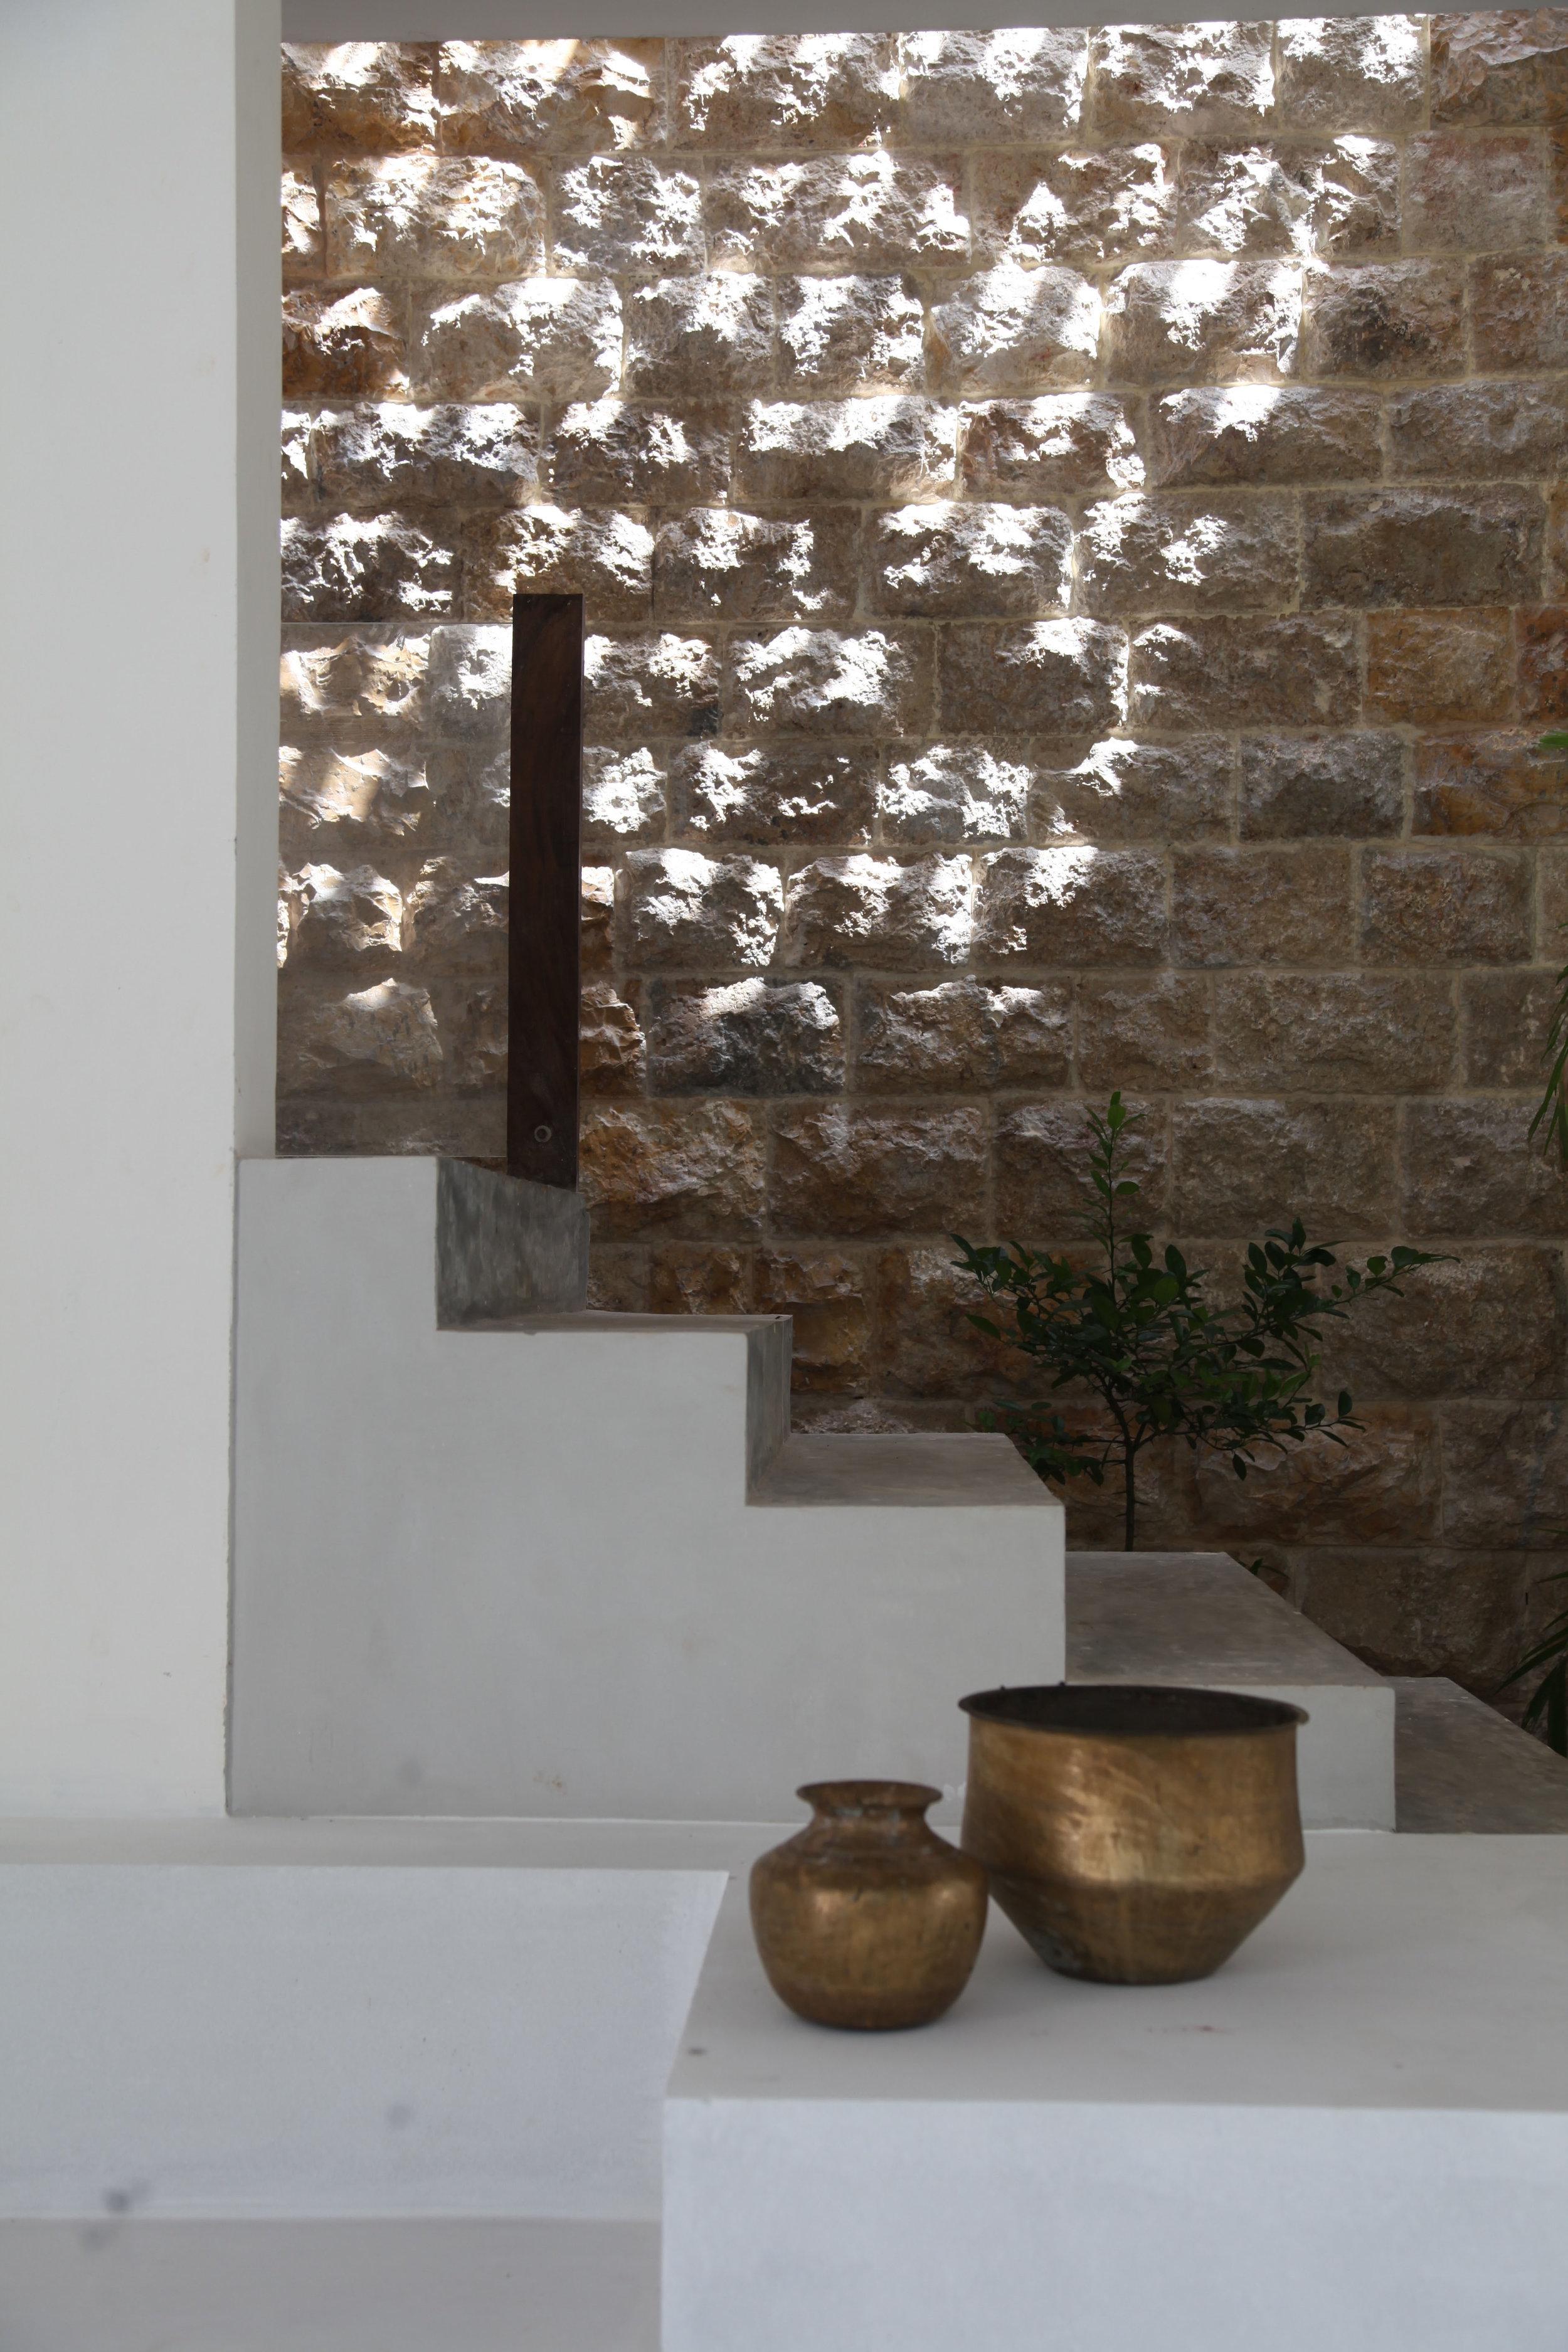 The Jaffna house - light, shadows and ventilation